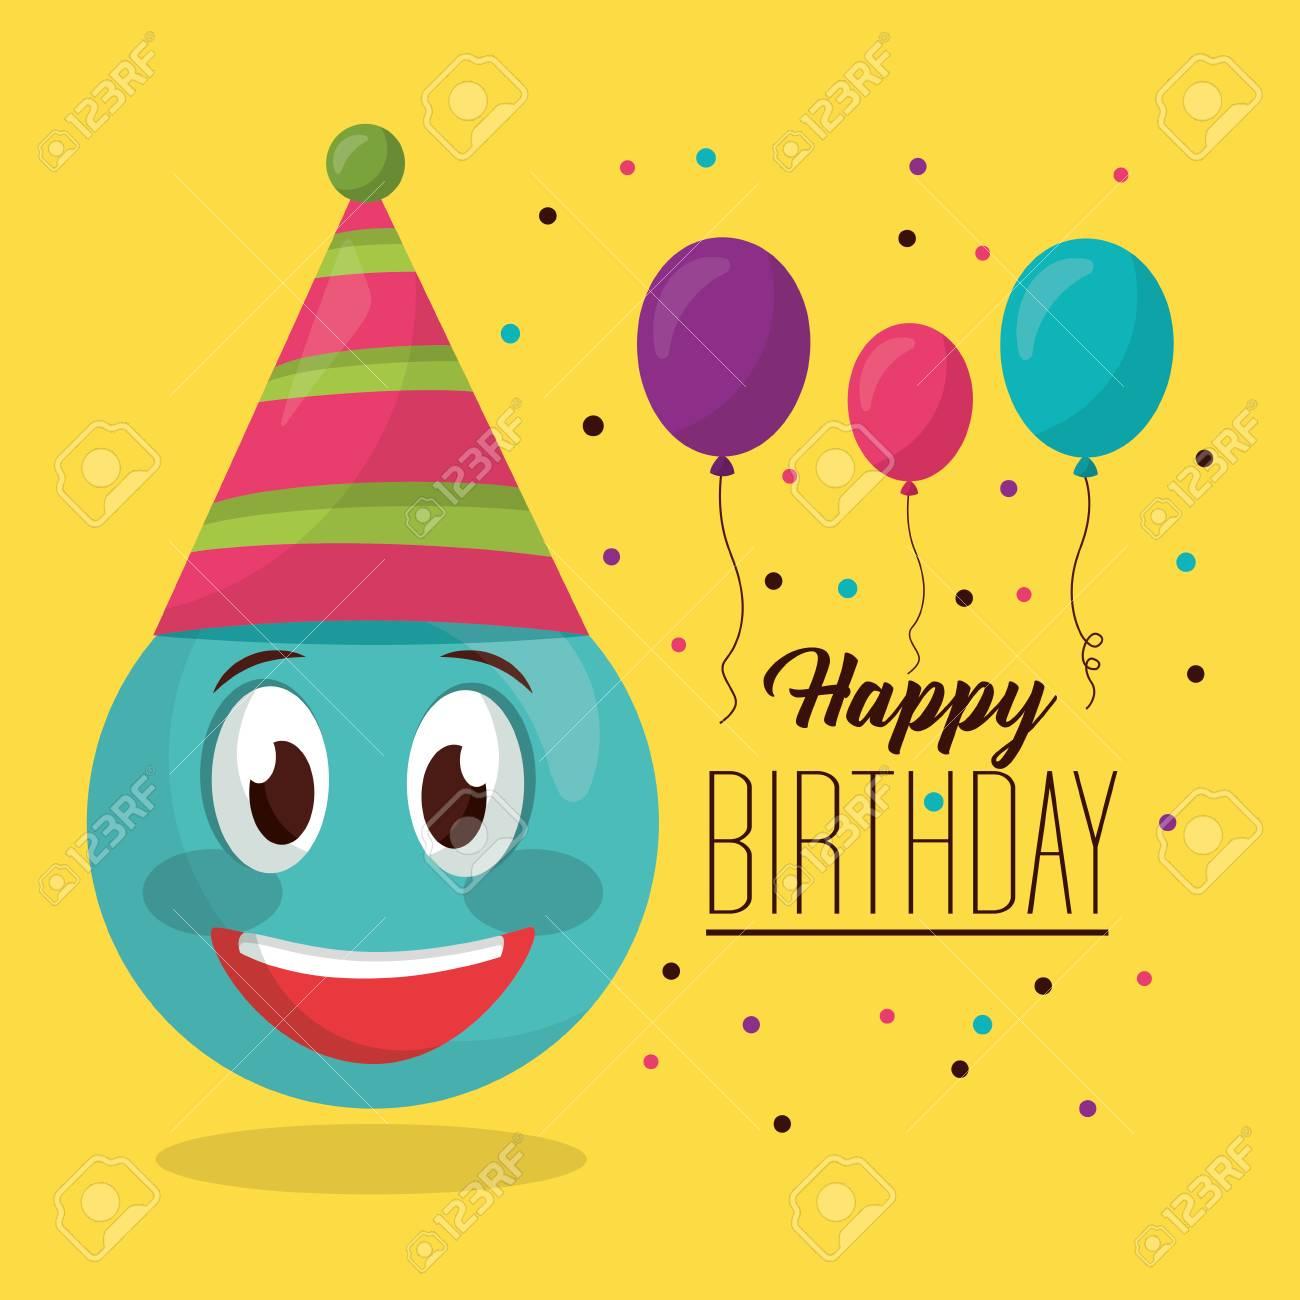 Happy Birthday Balloons Decoration Party Emoji Smiling Vector Illustration Stock